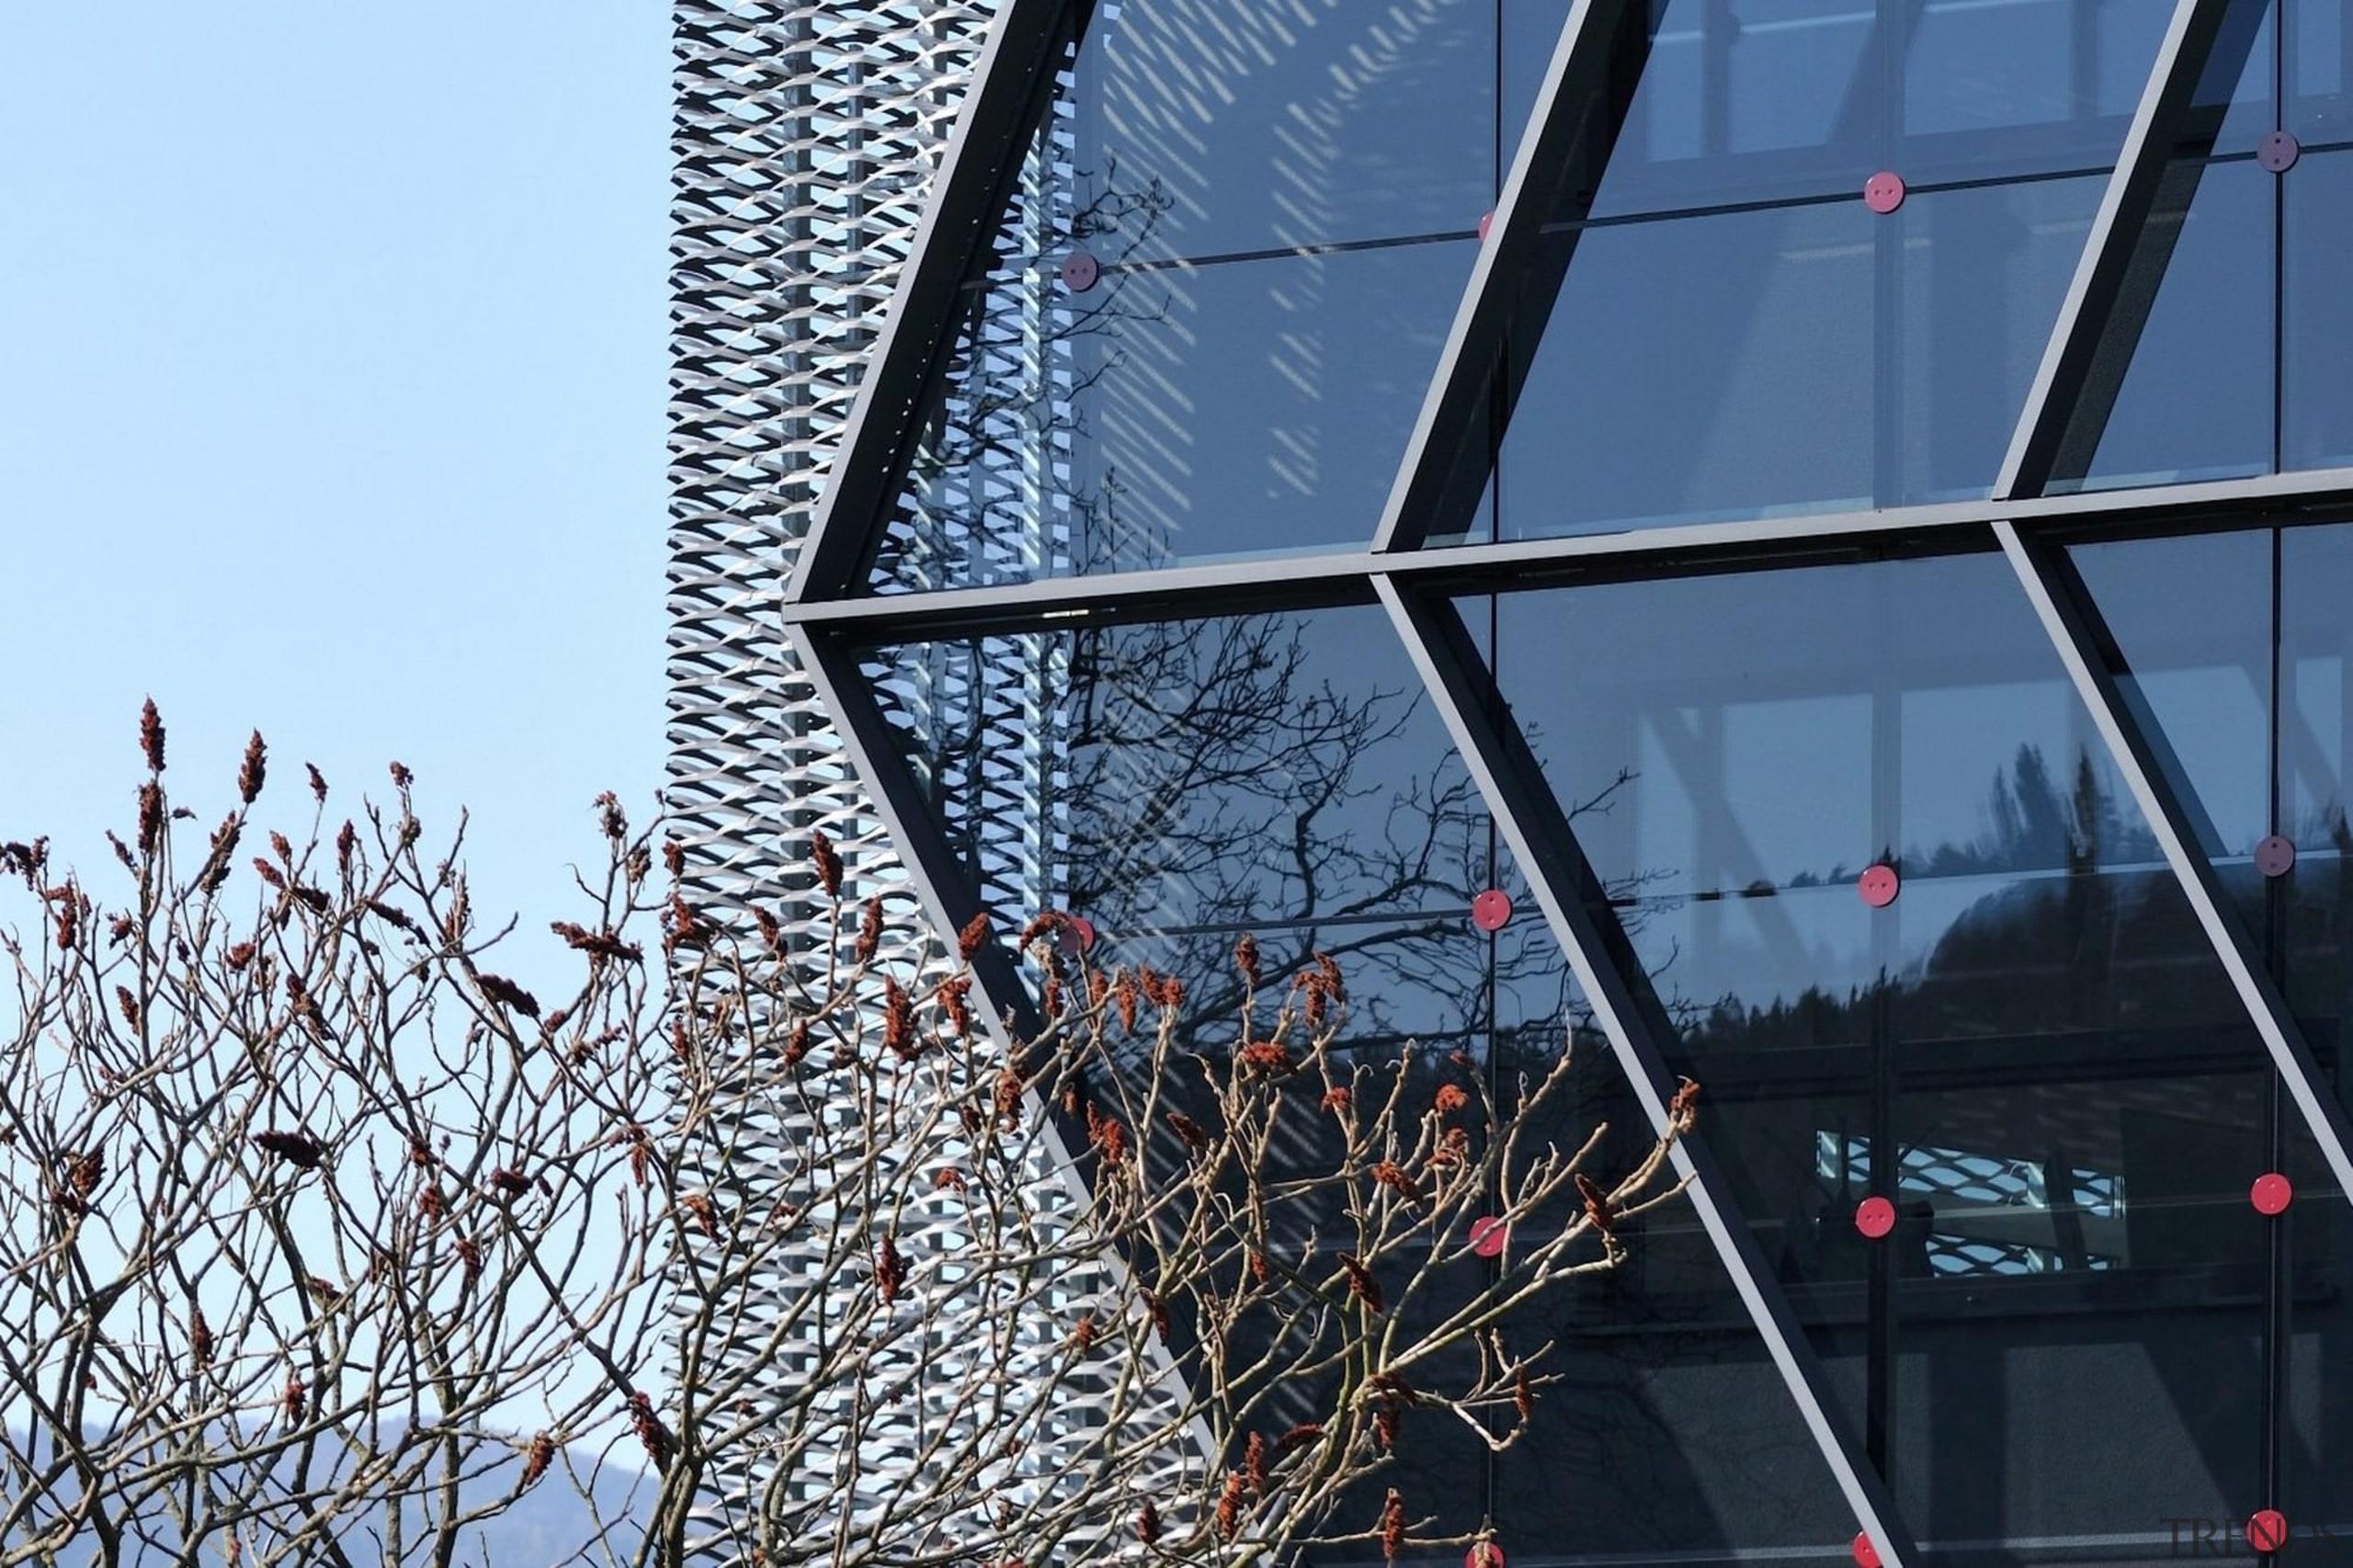 Architect: SuperformPhotography by Miran Kambič architecture, building, city, daytime, facade, metropolis, metropolitan area, reflection, sky, skyscraper, structure, tourist attraction, tree, urban area, window, black, teal, blue